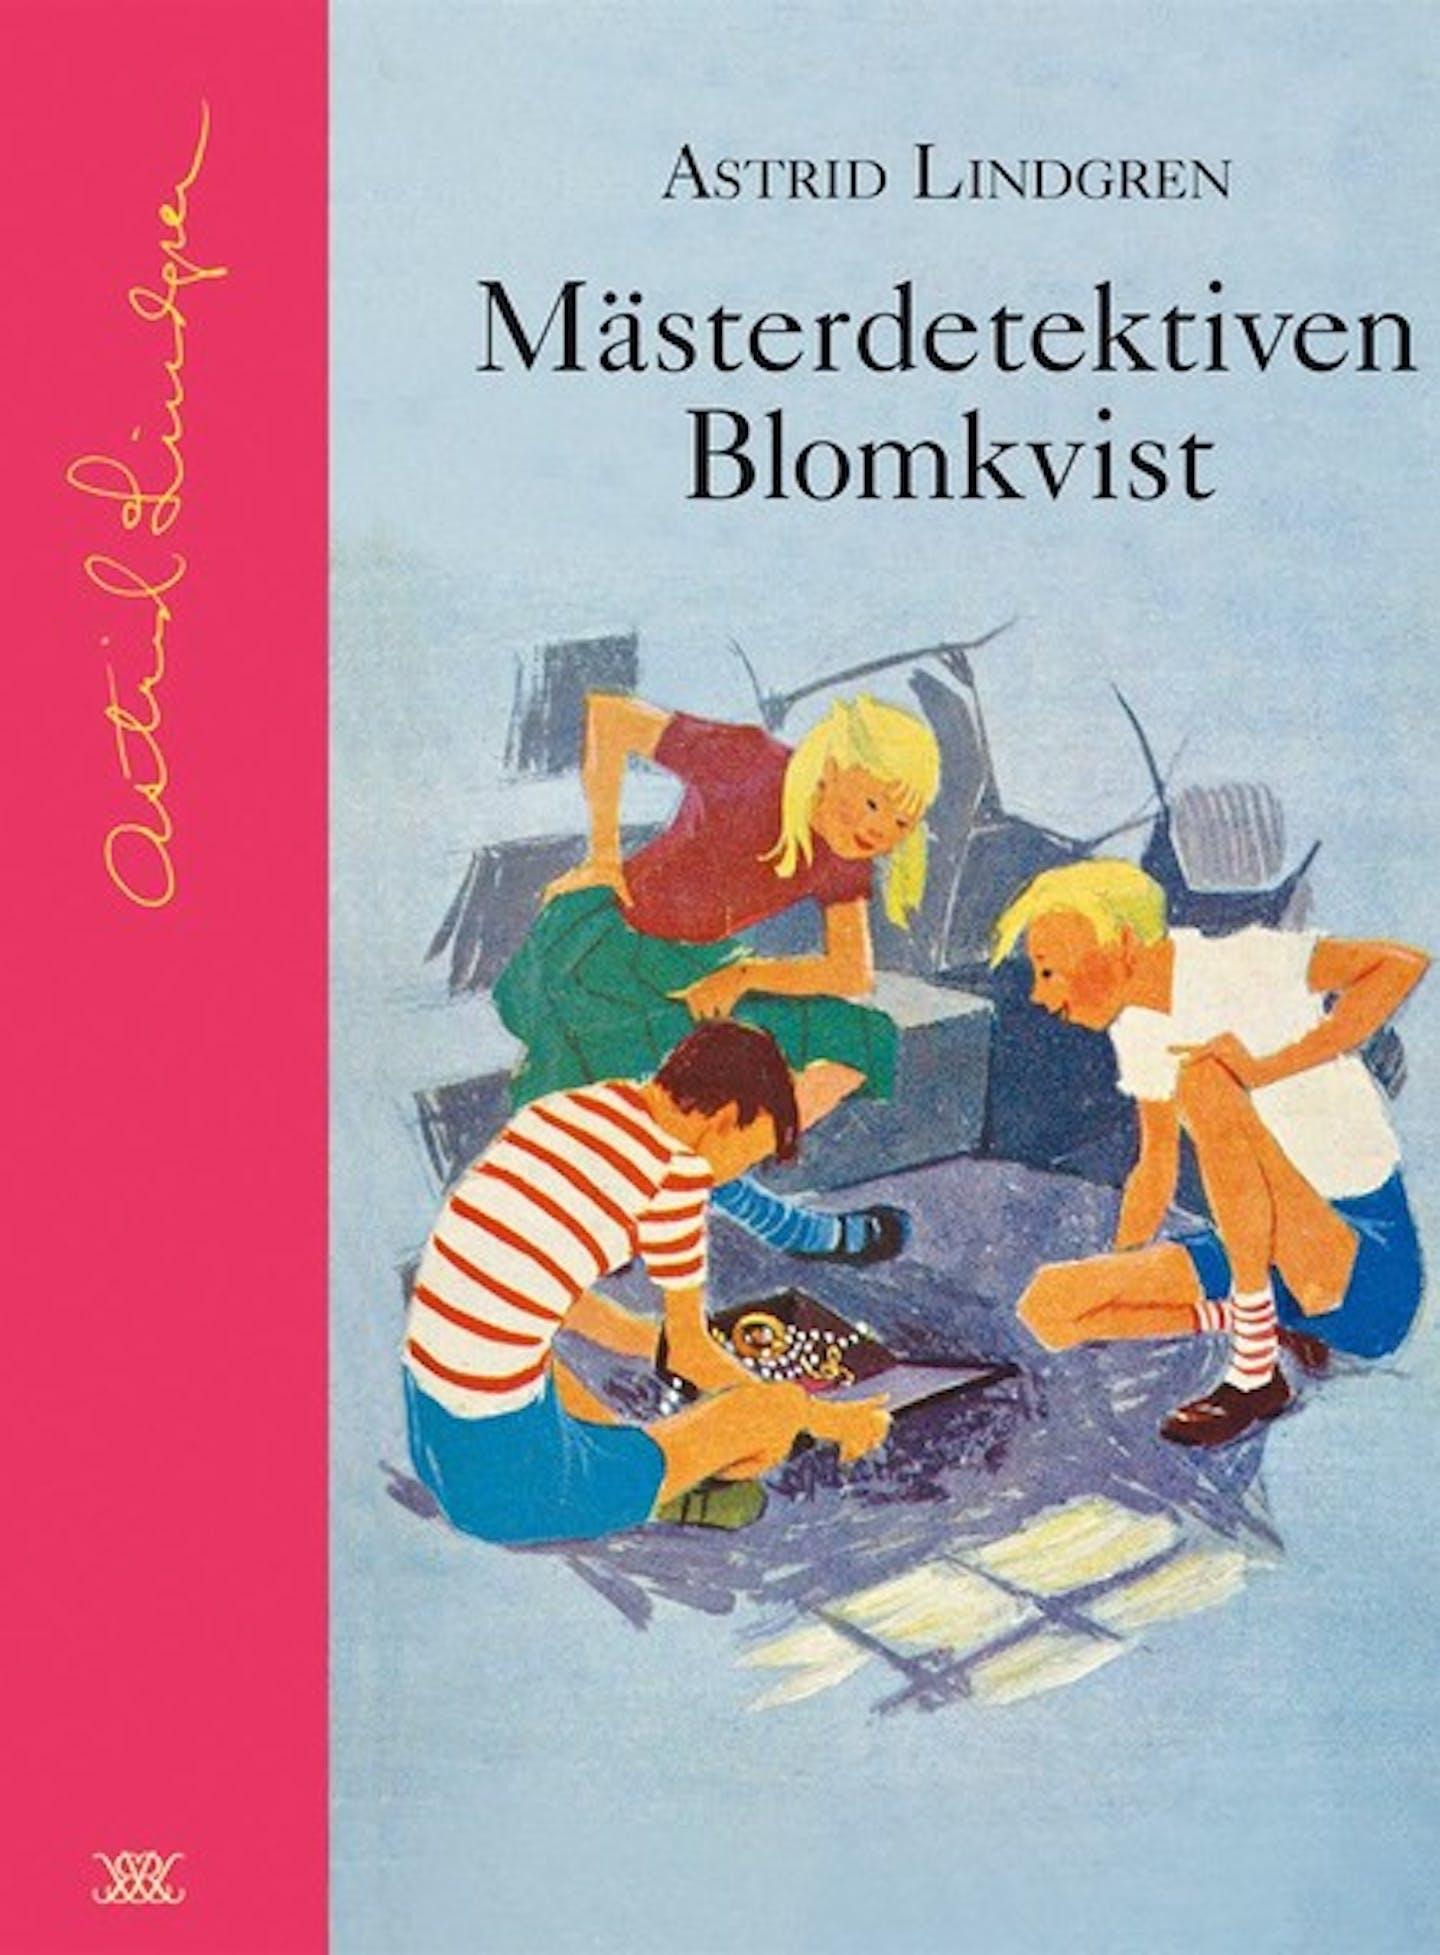 astrid lindgrens böcker